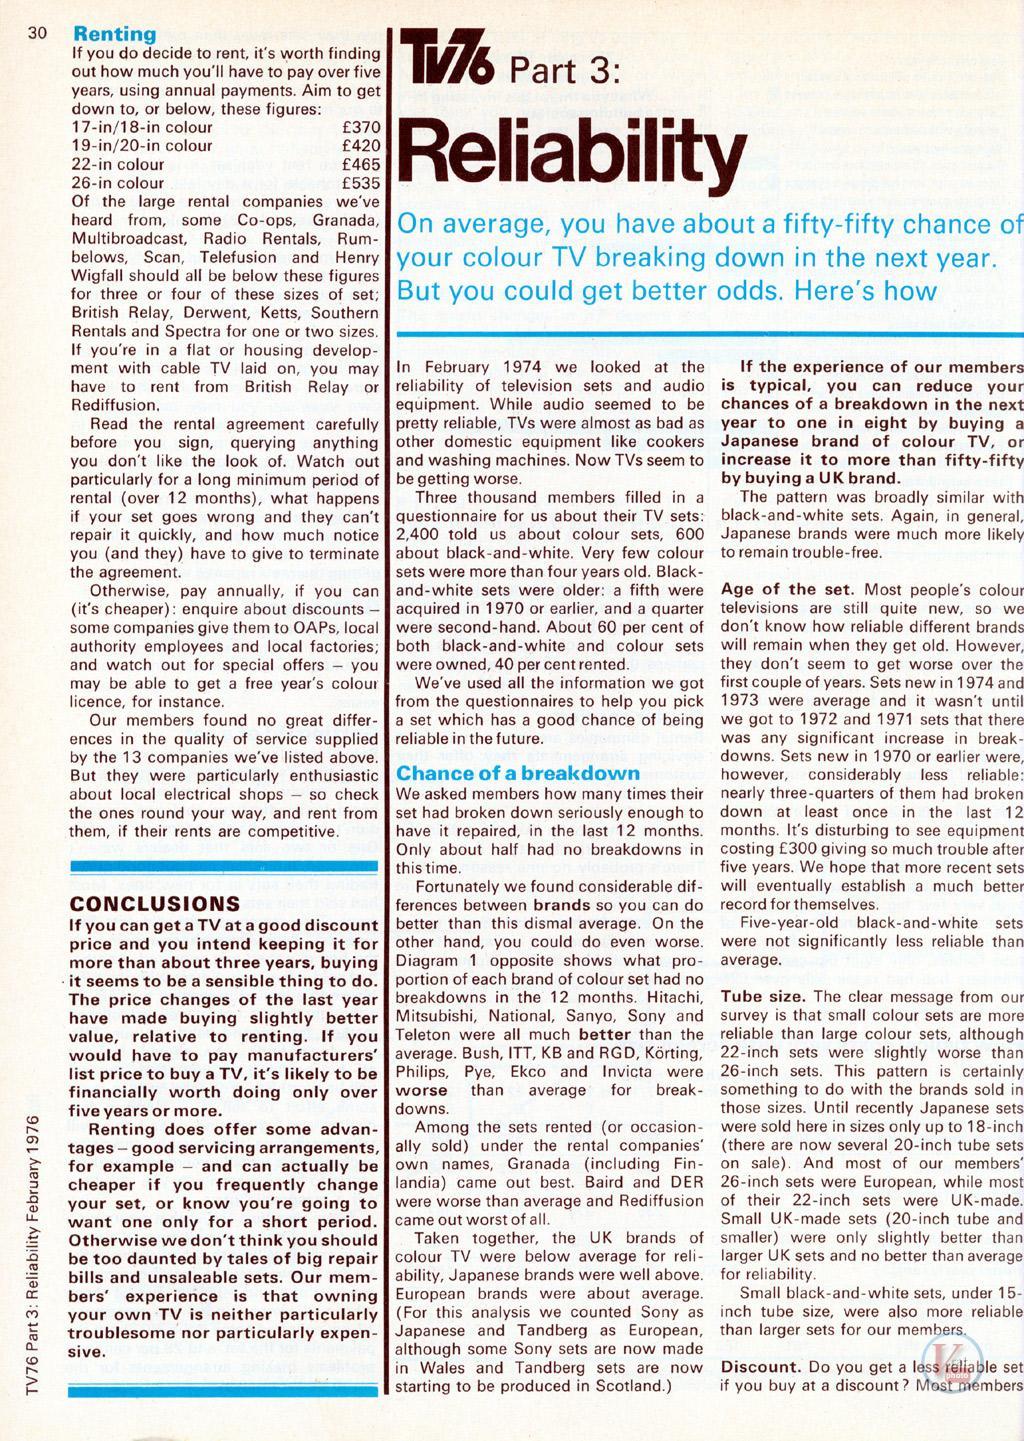 1976 Report 5